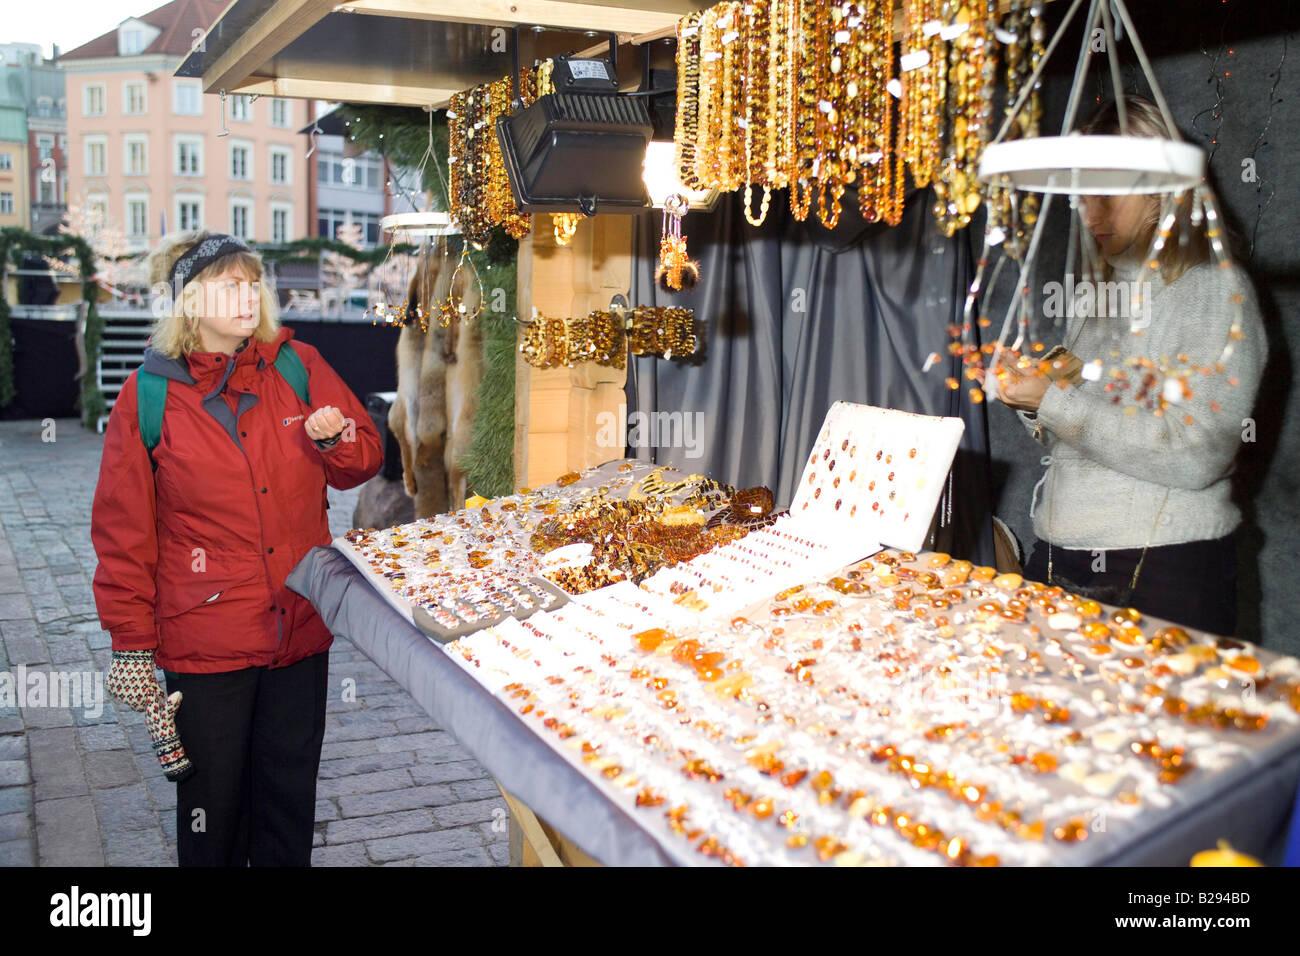 Christmas Market Riga Latvia Date 11 02 2008 Ref ZB693 110474 0157 COMPULSORY CREDIT World Pictures Photoshot - Stock Image